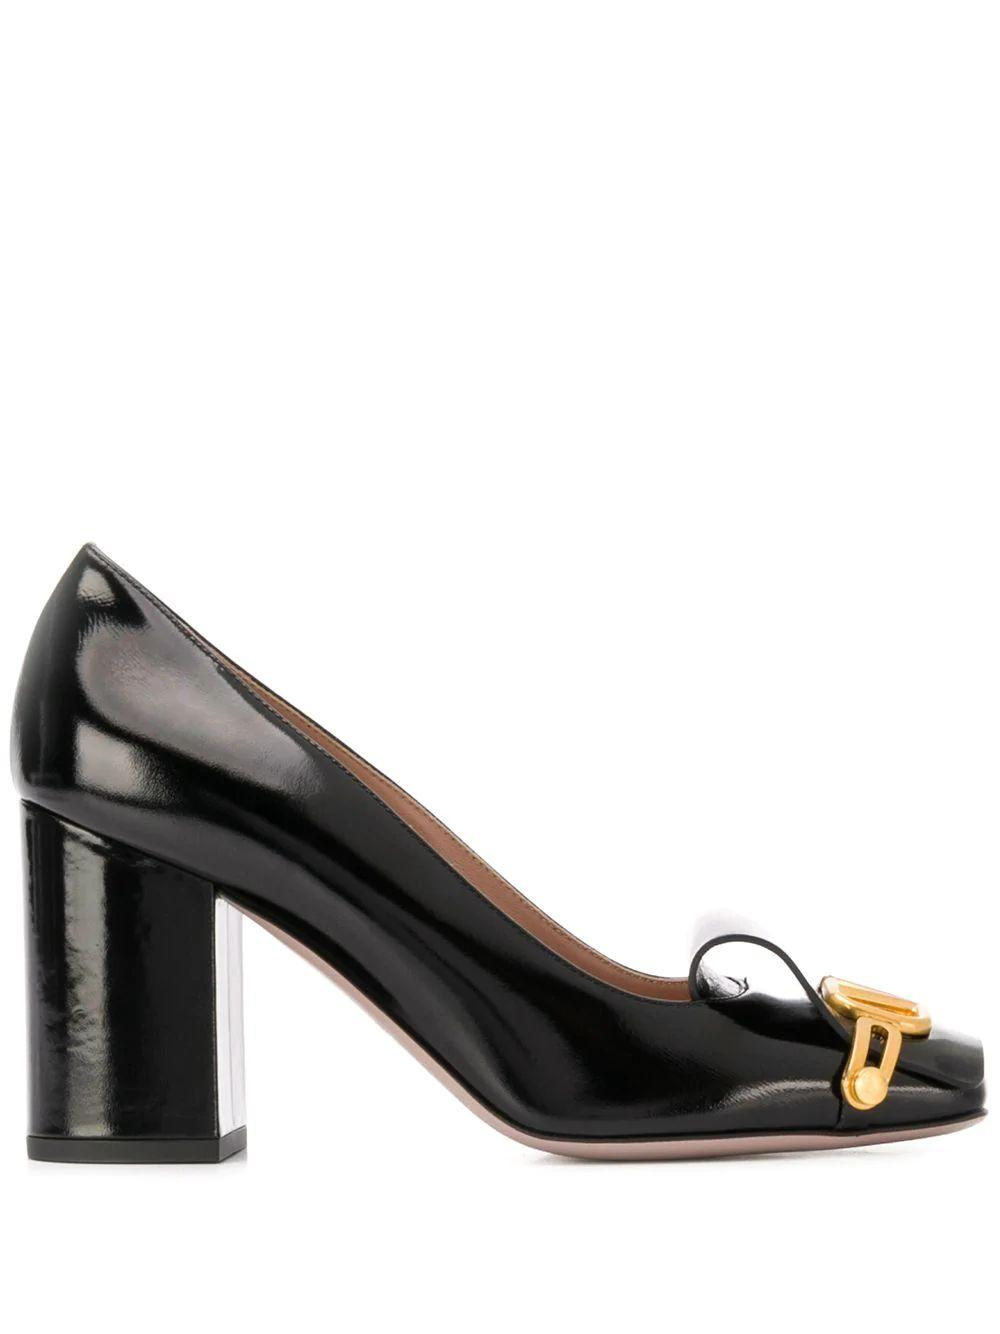 V Logo 85mm Patent Block Heel Pump Item # TW2S0V56EYQ0NO